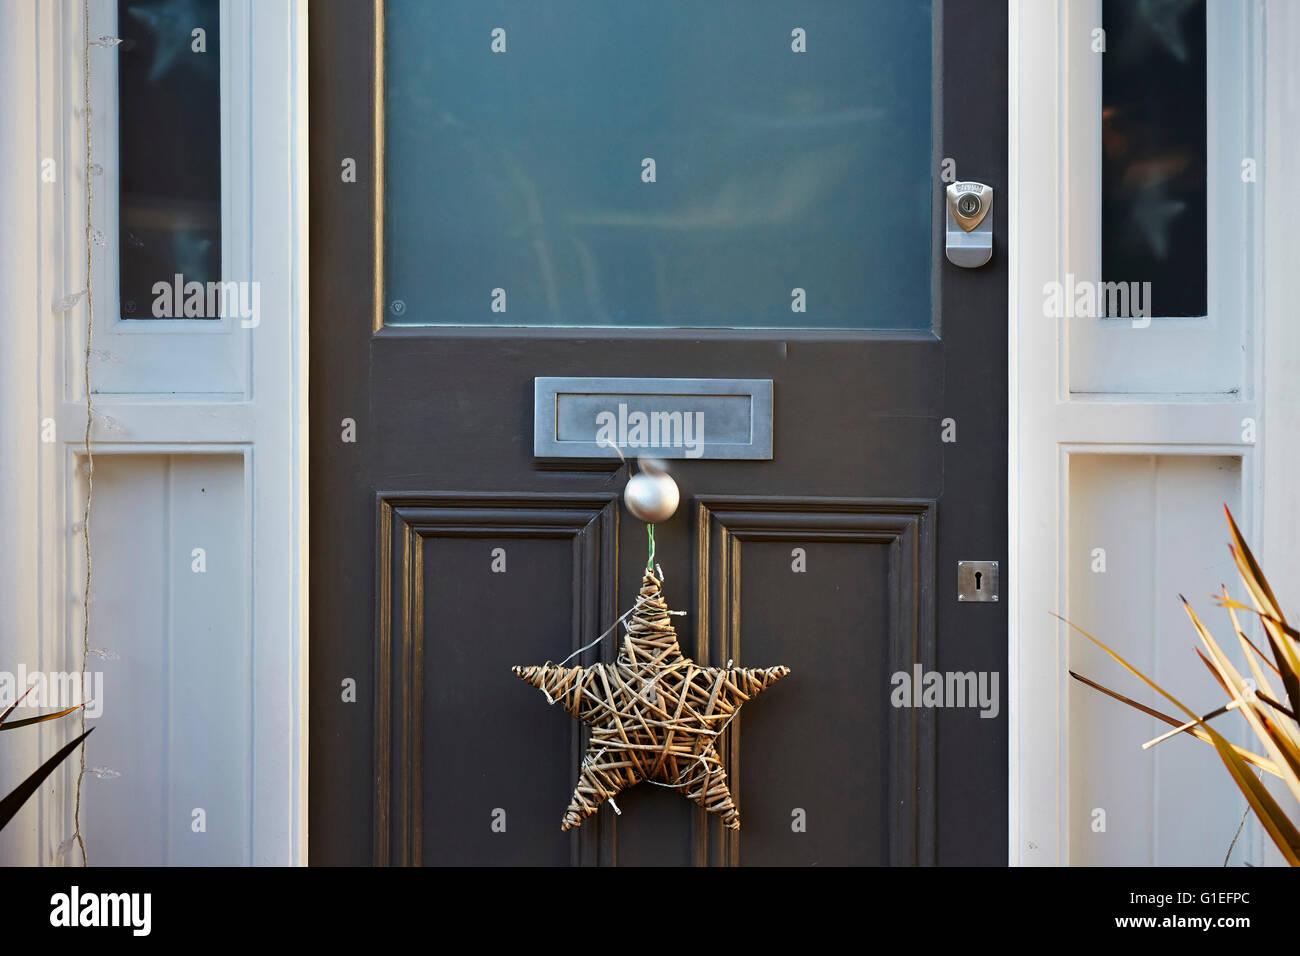 Ghirlanda di Natale sulla porta. A forma di stella ghirlanda appesa masaneta. Immagini Stock